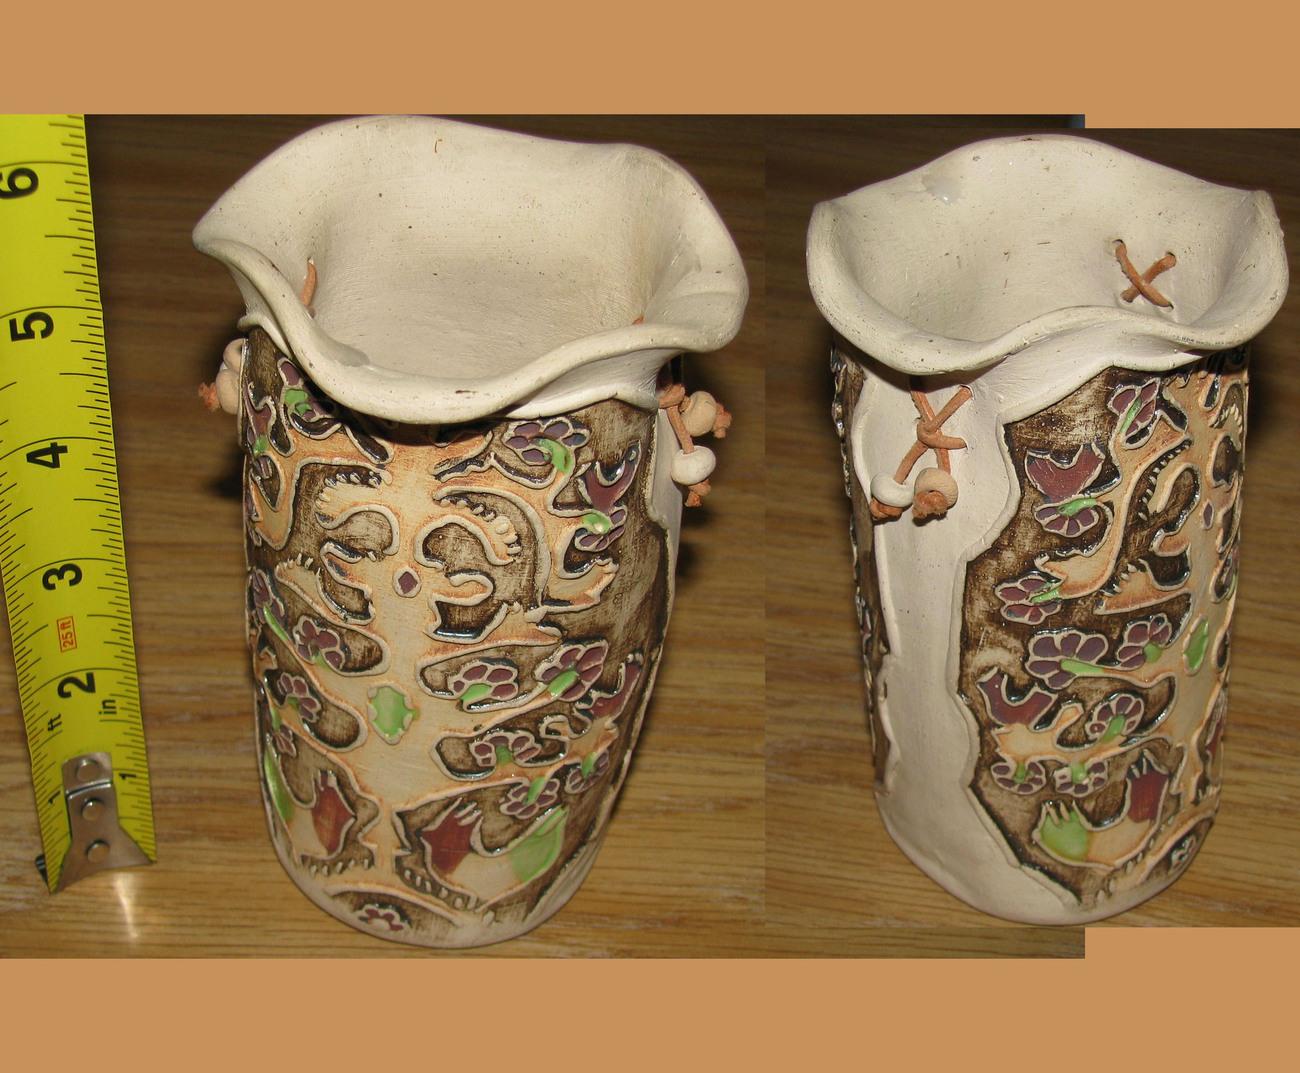 1 mucu gres vase from merida venezuela